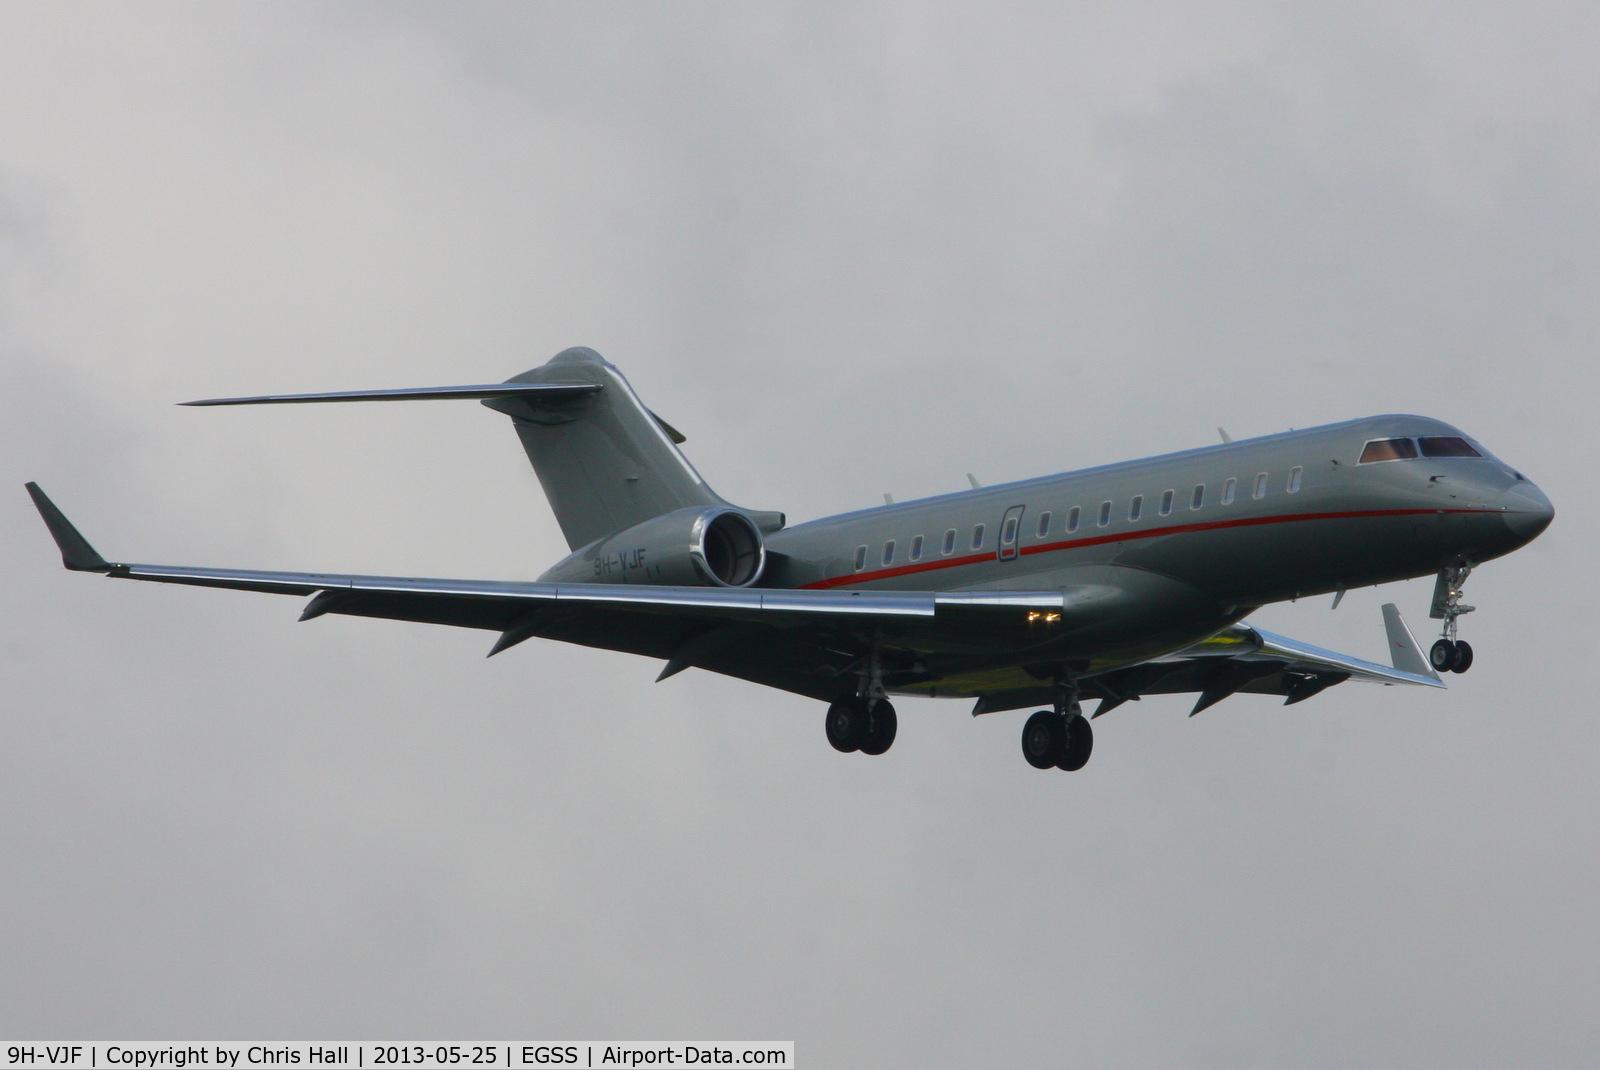 9H-VJF, 2012 Bombardier BD-700-1A10 Global 6000 C/N 9503, VistaJet